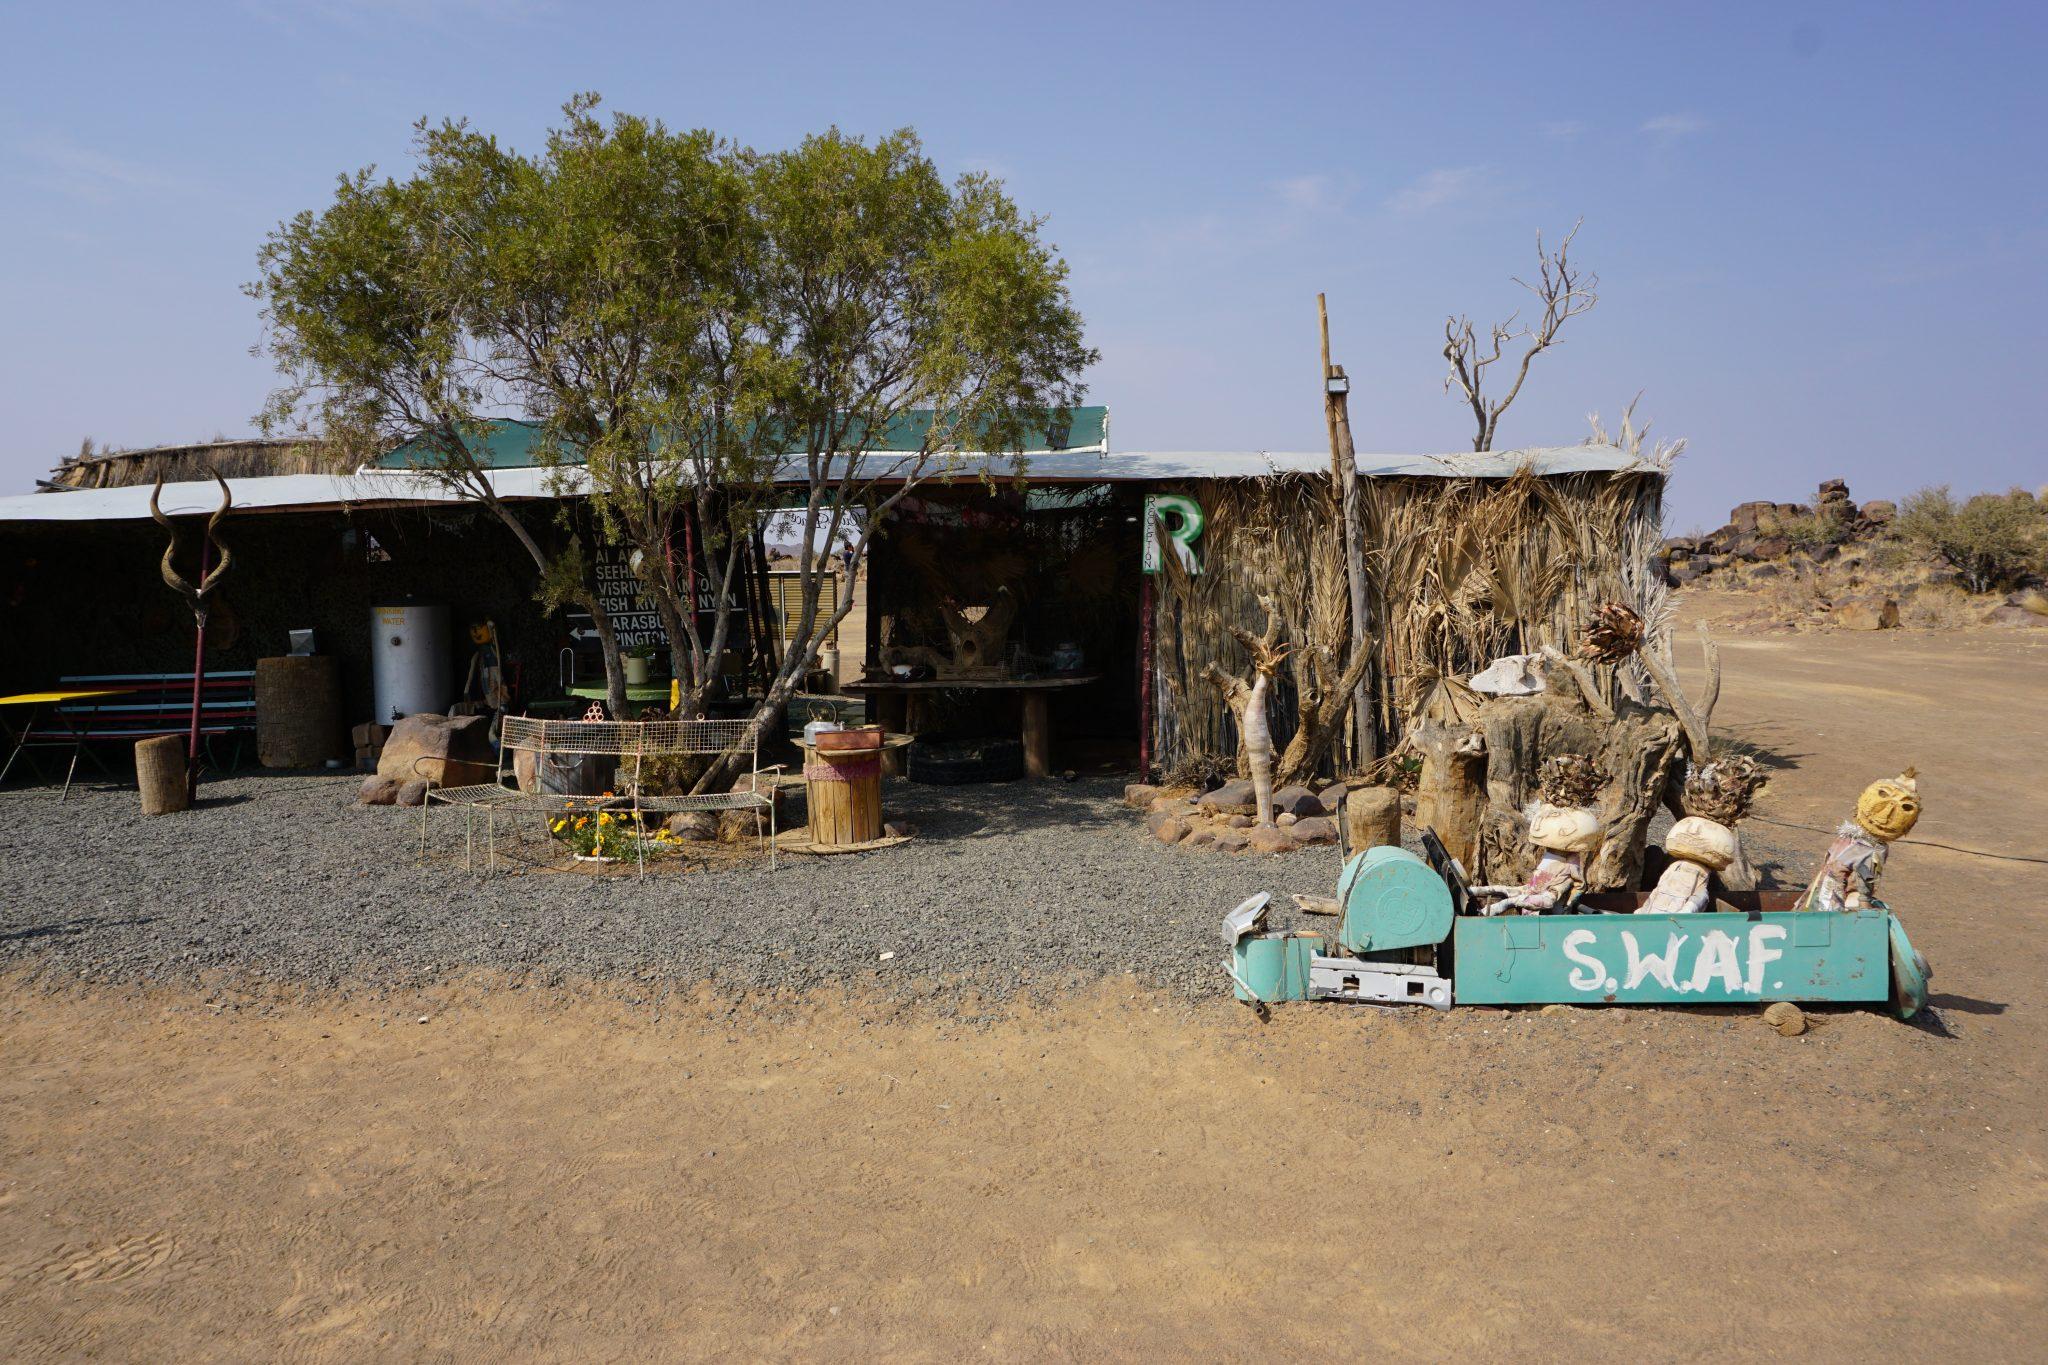 Namibia Reise: Unsere erste Campsite